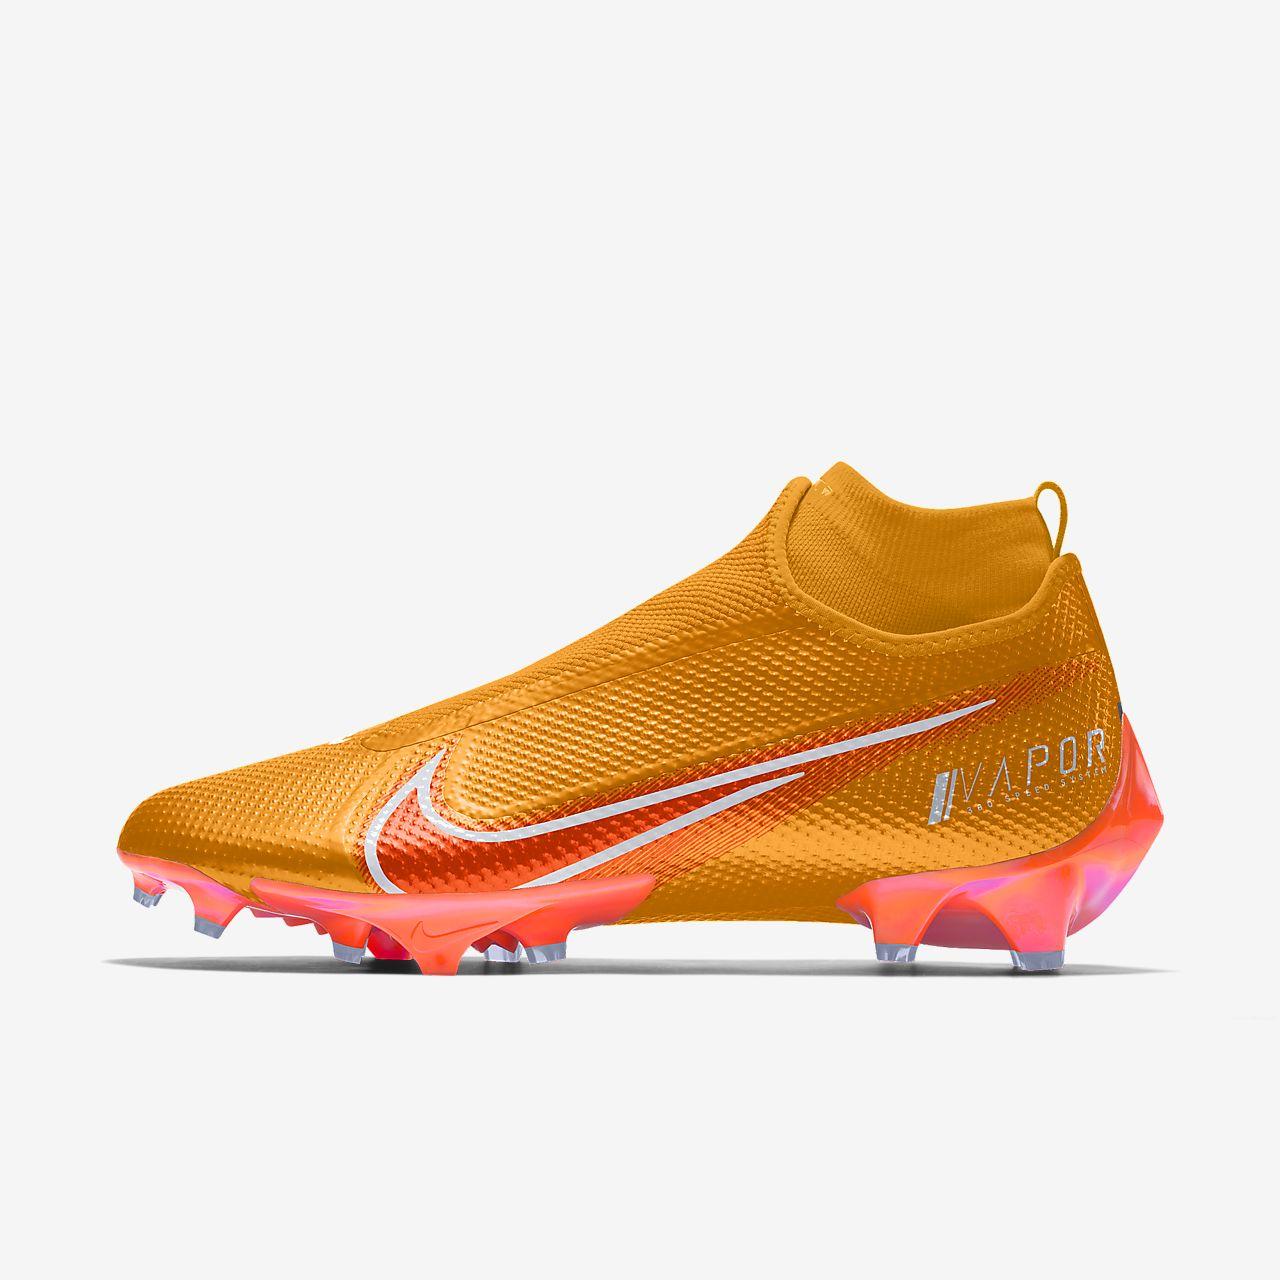 Nike Vapor Edge Pro 360 Premium By You Custom American Football Boot